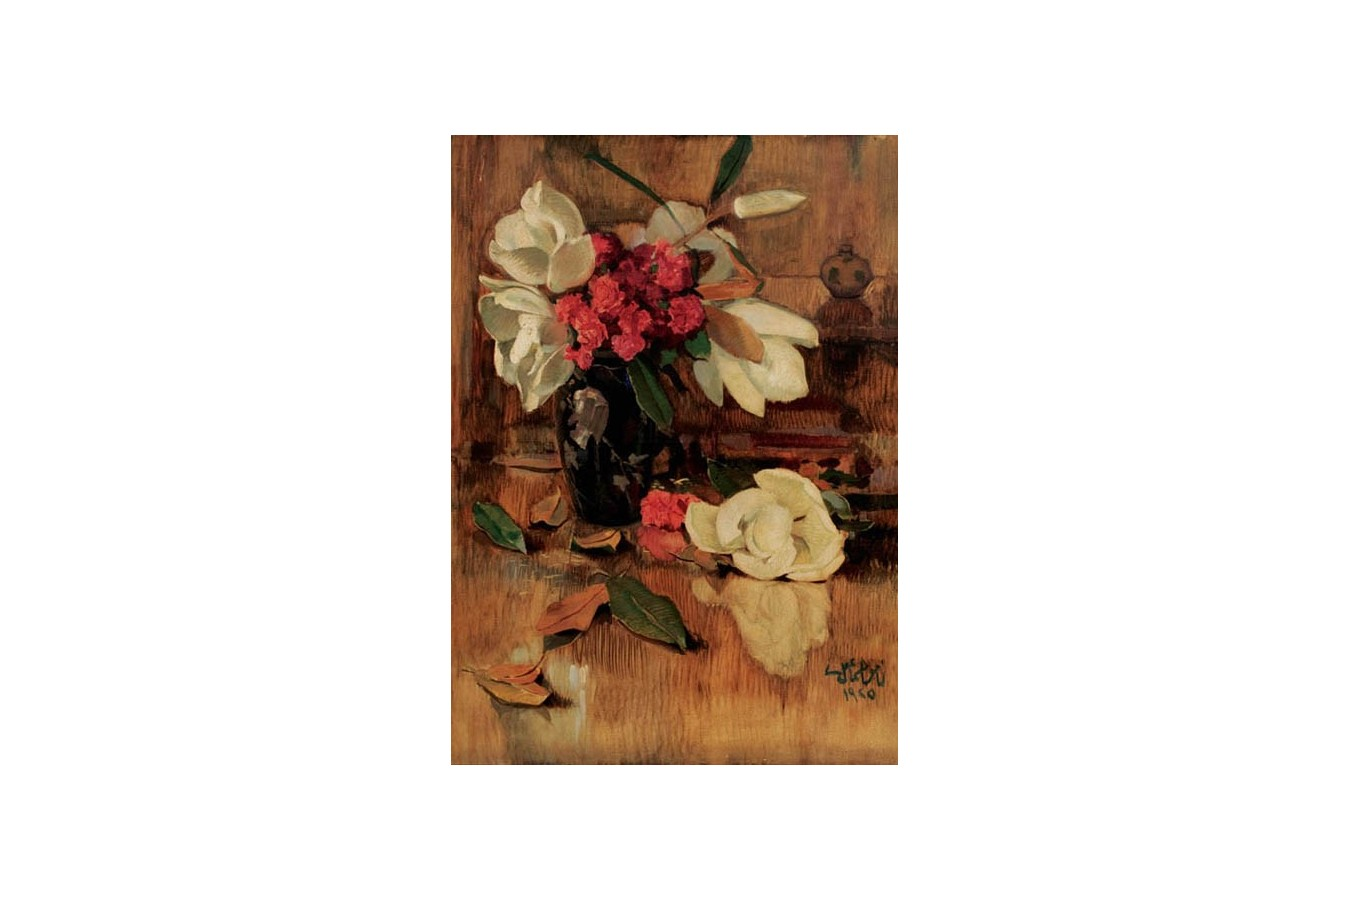 Puzzle Gold Puzzle - Namik Ismail: Magnolia and Clavels, 1.000 piese (Gold-Puzzle-60324) imagine